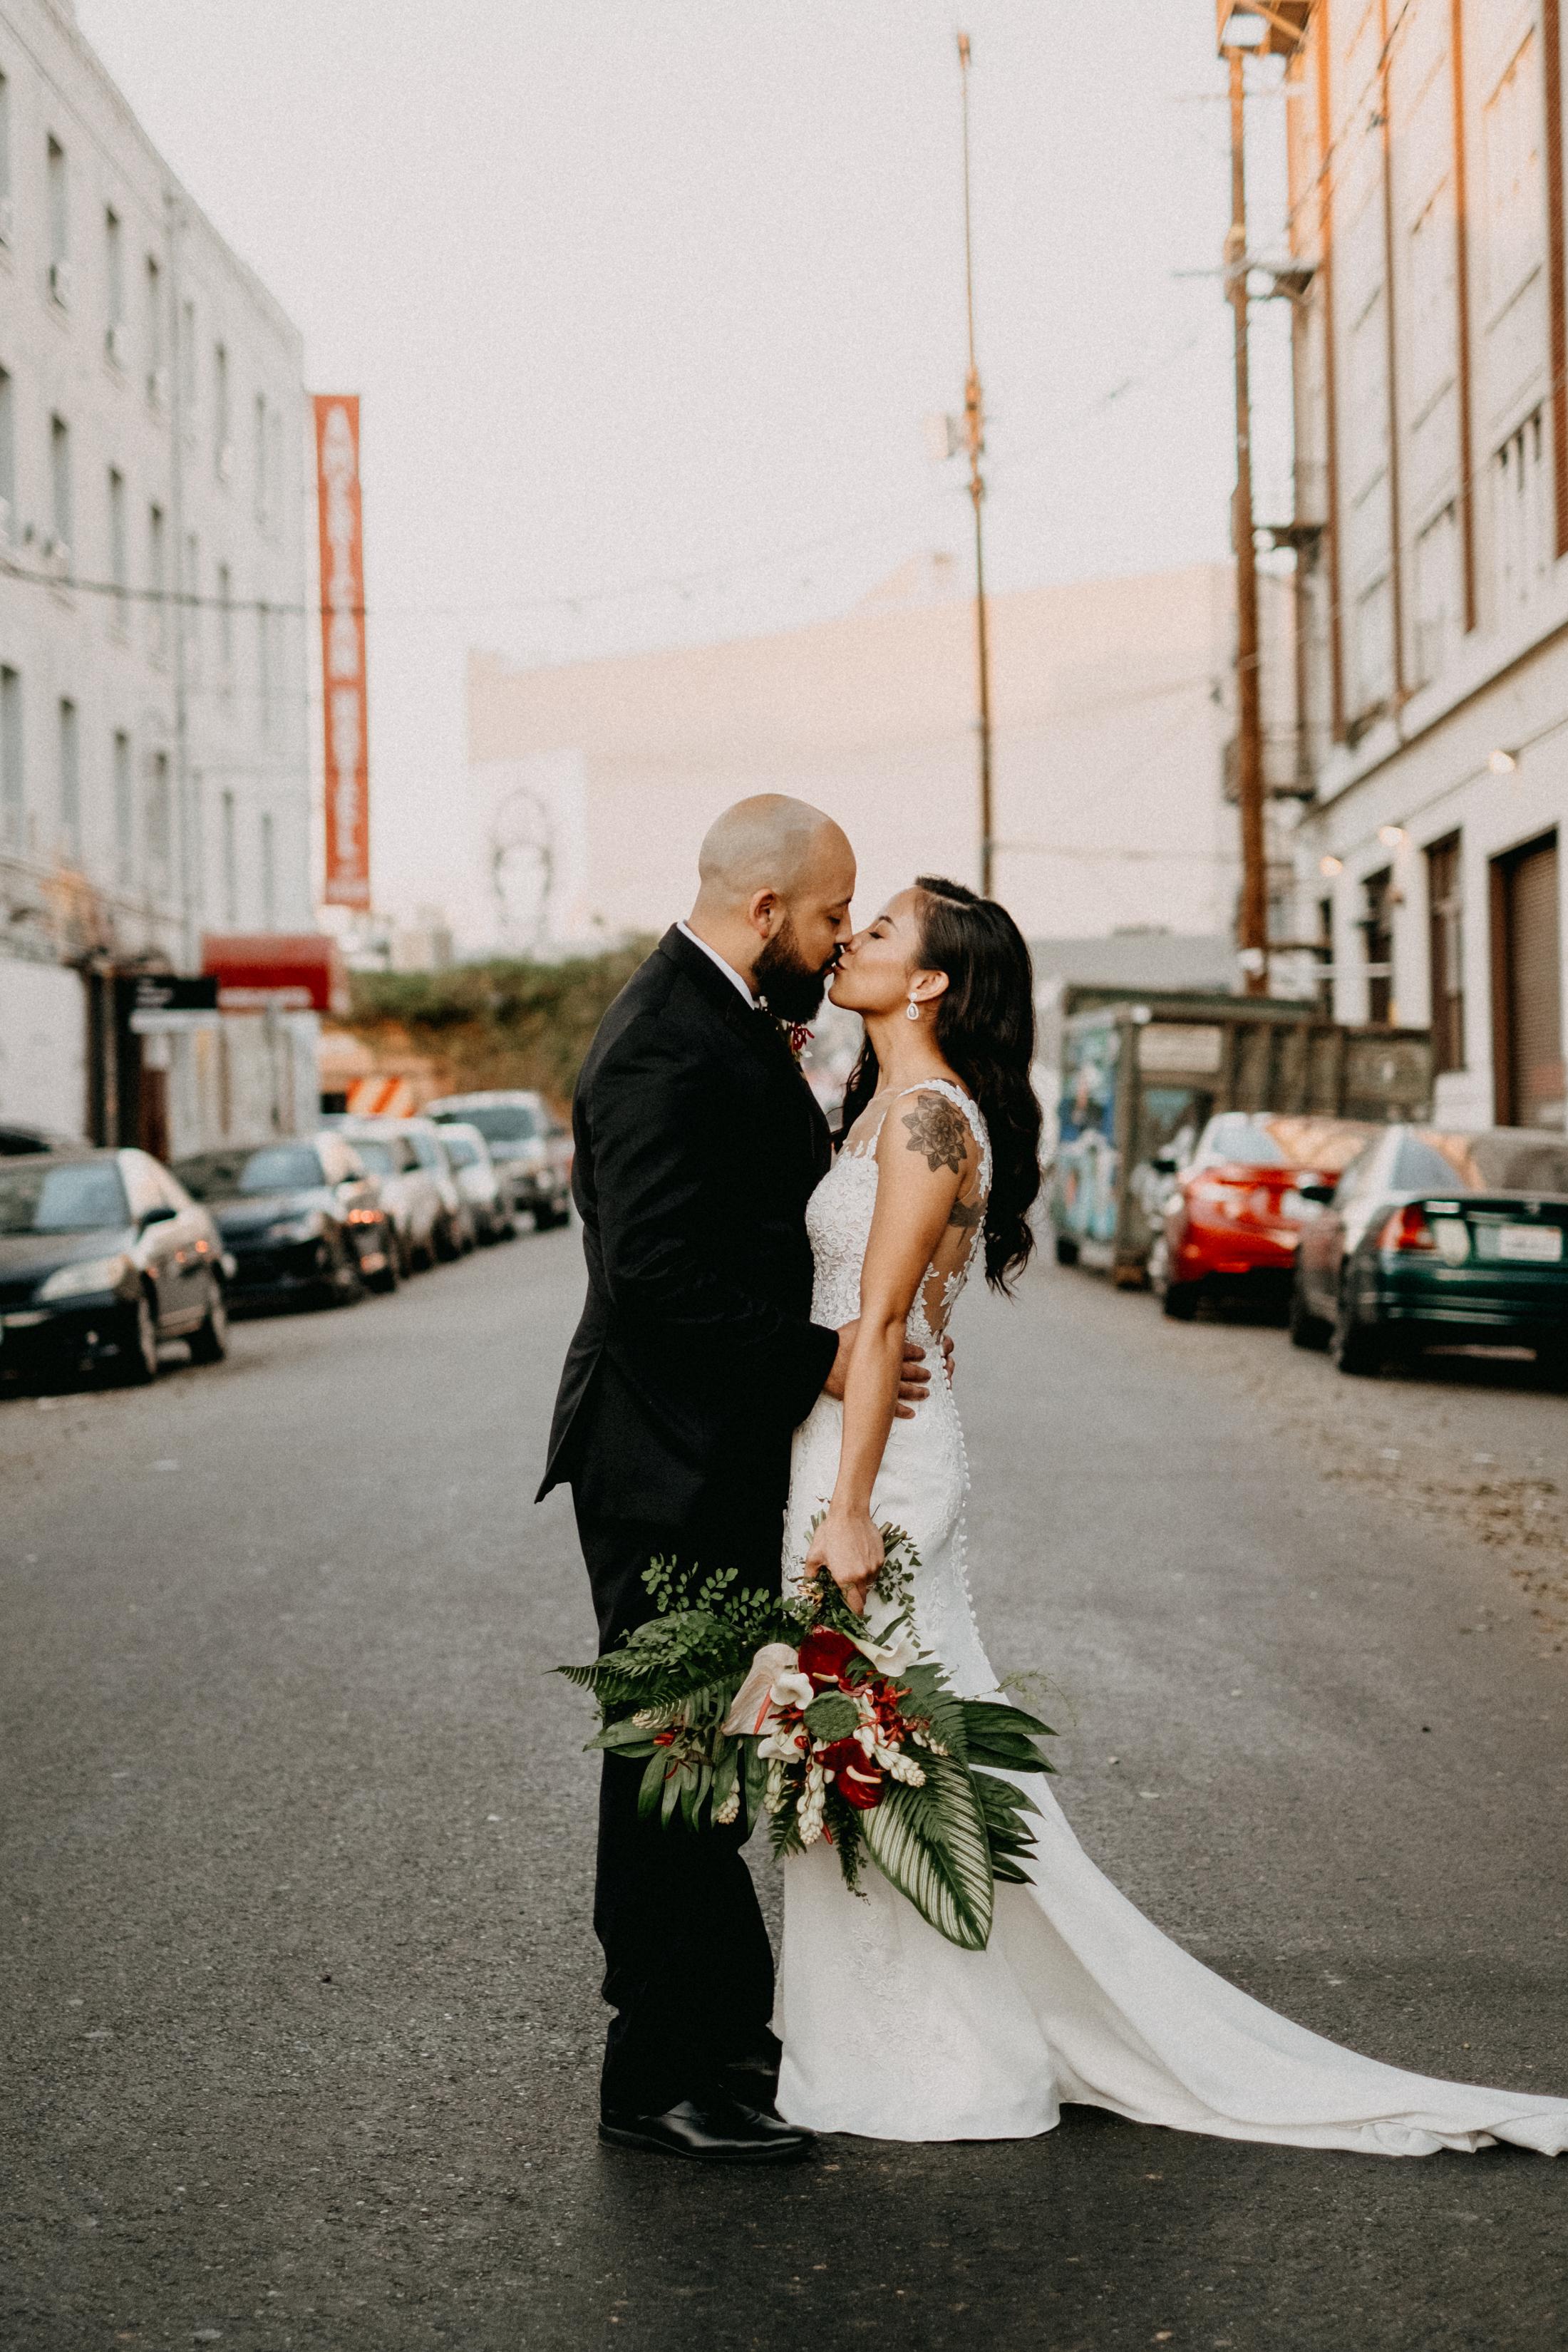 Dark_Tropical_Florals_Sibyl_Sophia_Wedding_Kiss.jpg